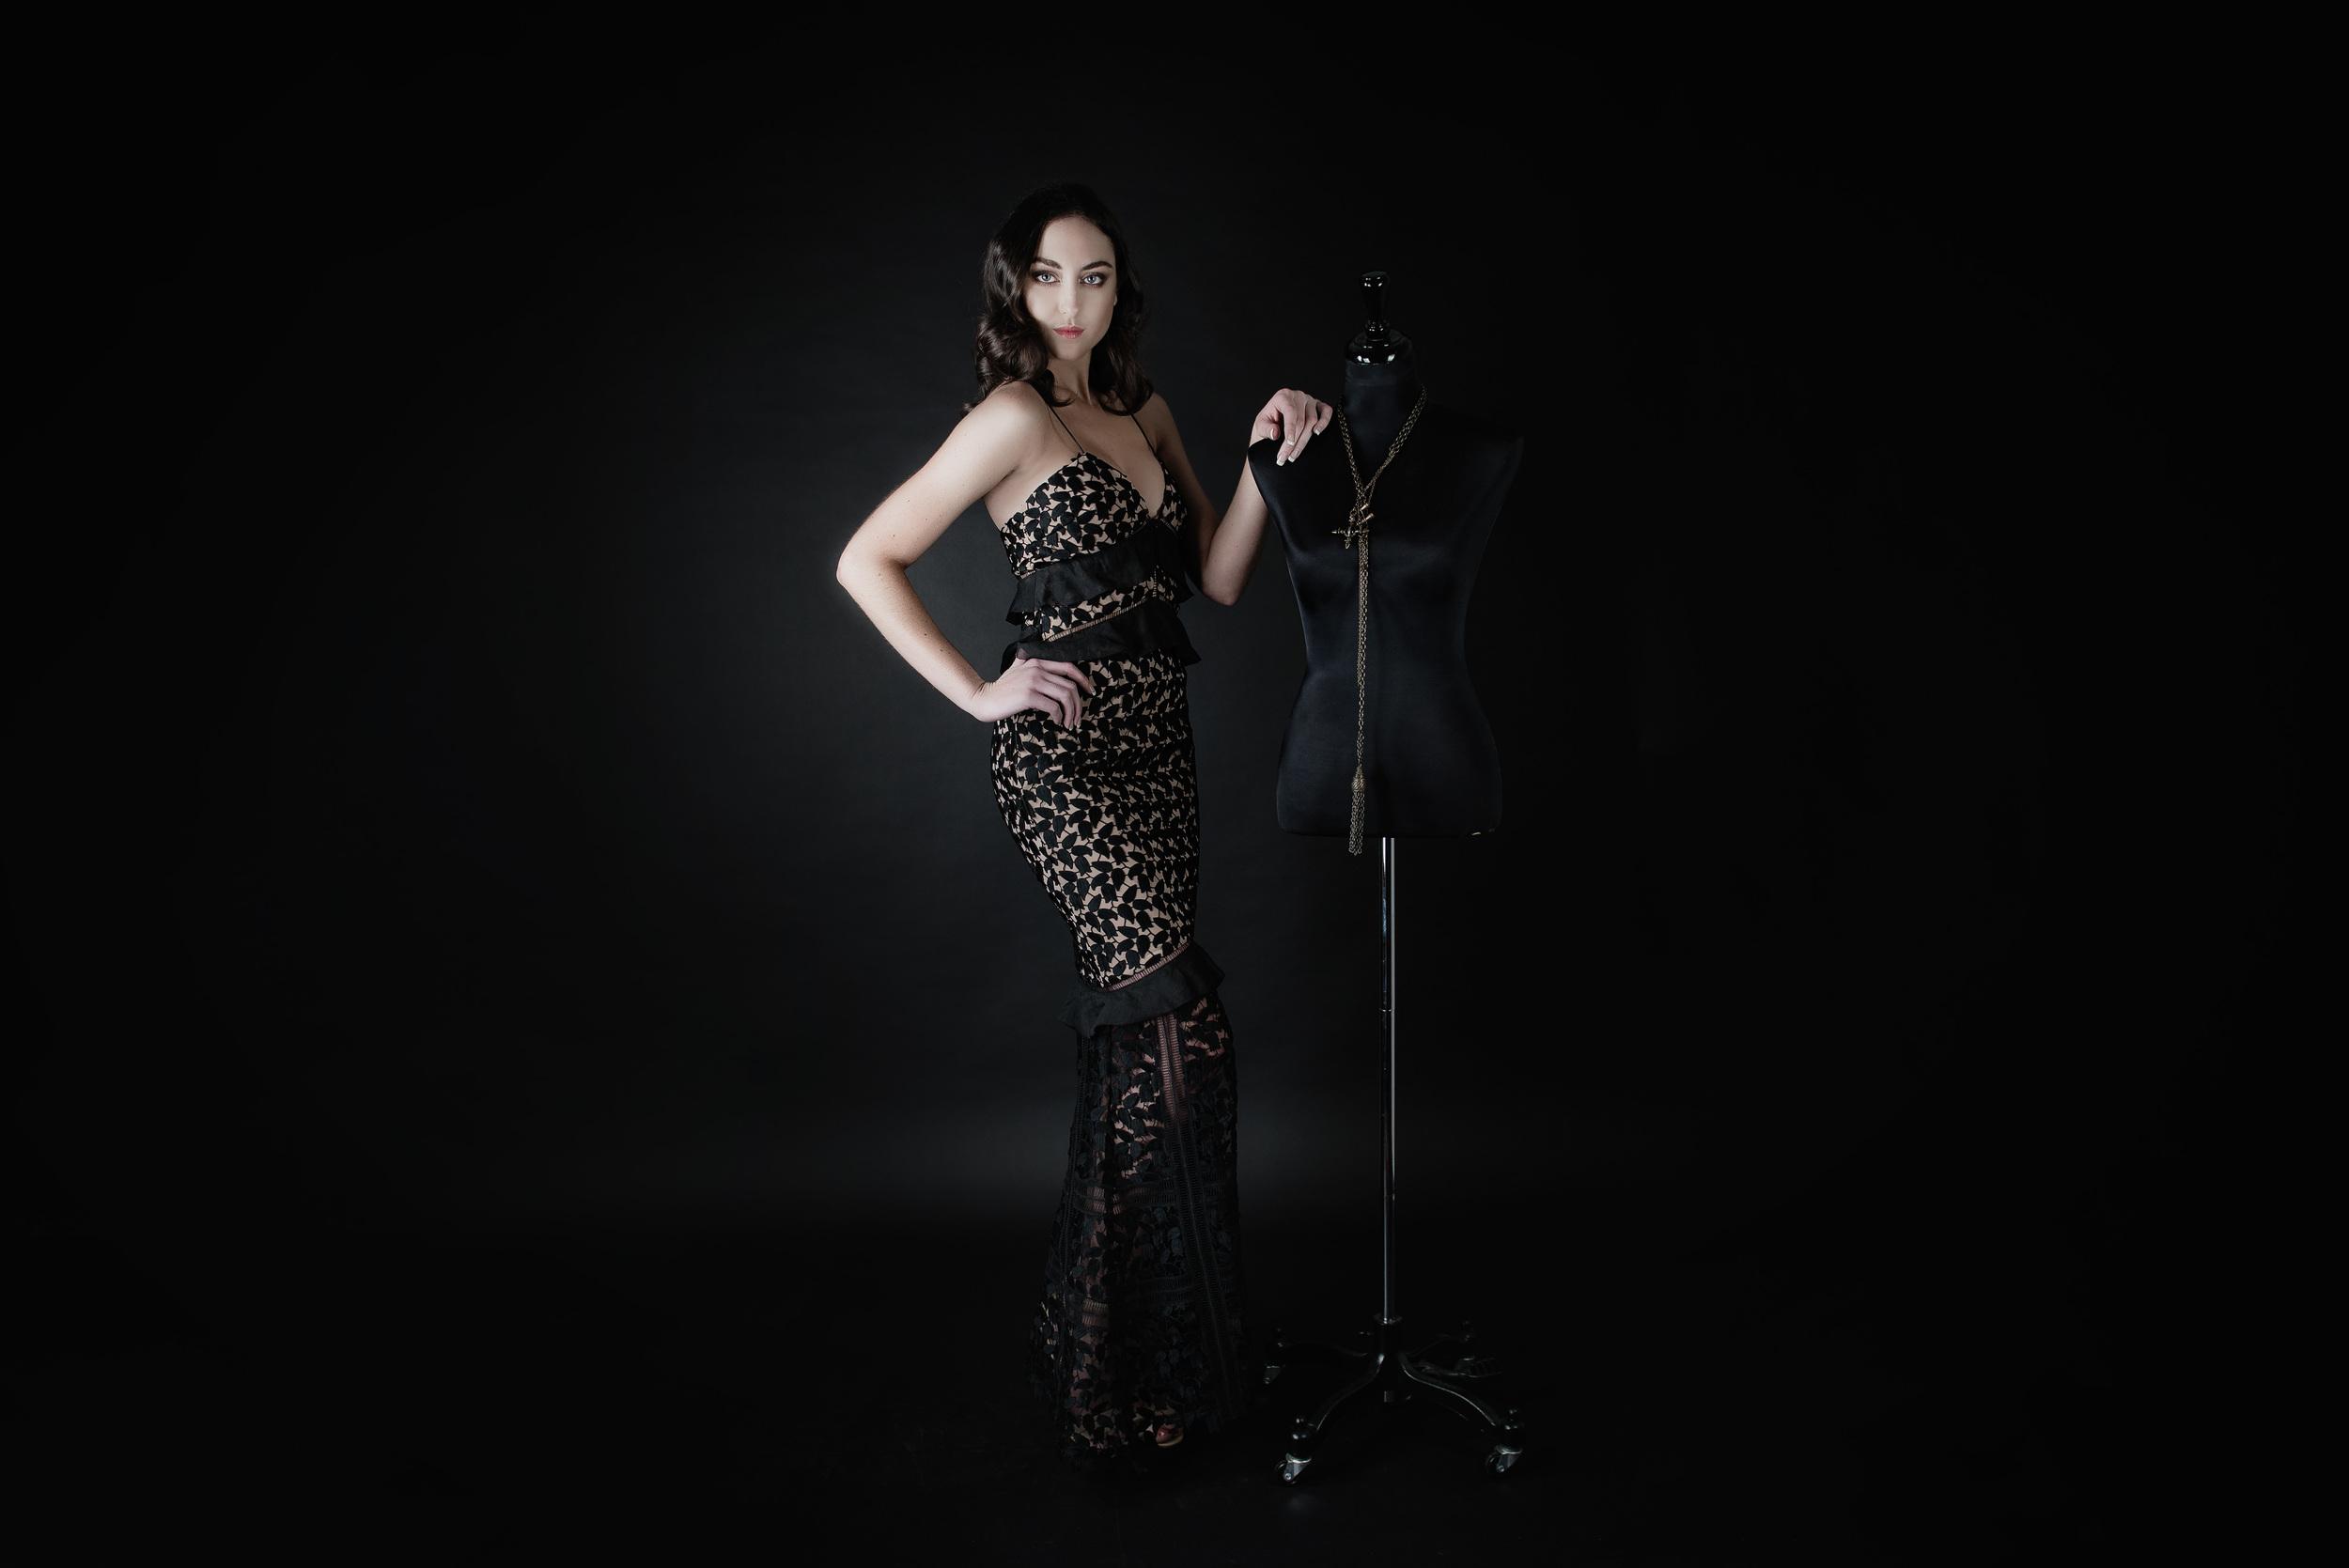 hero-blk-that-dress-for-hire-3505-Edit.jpg